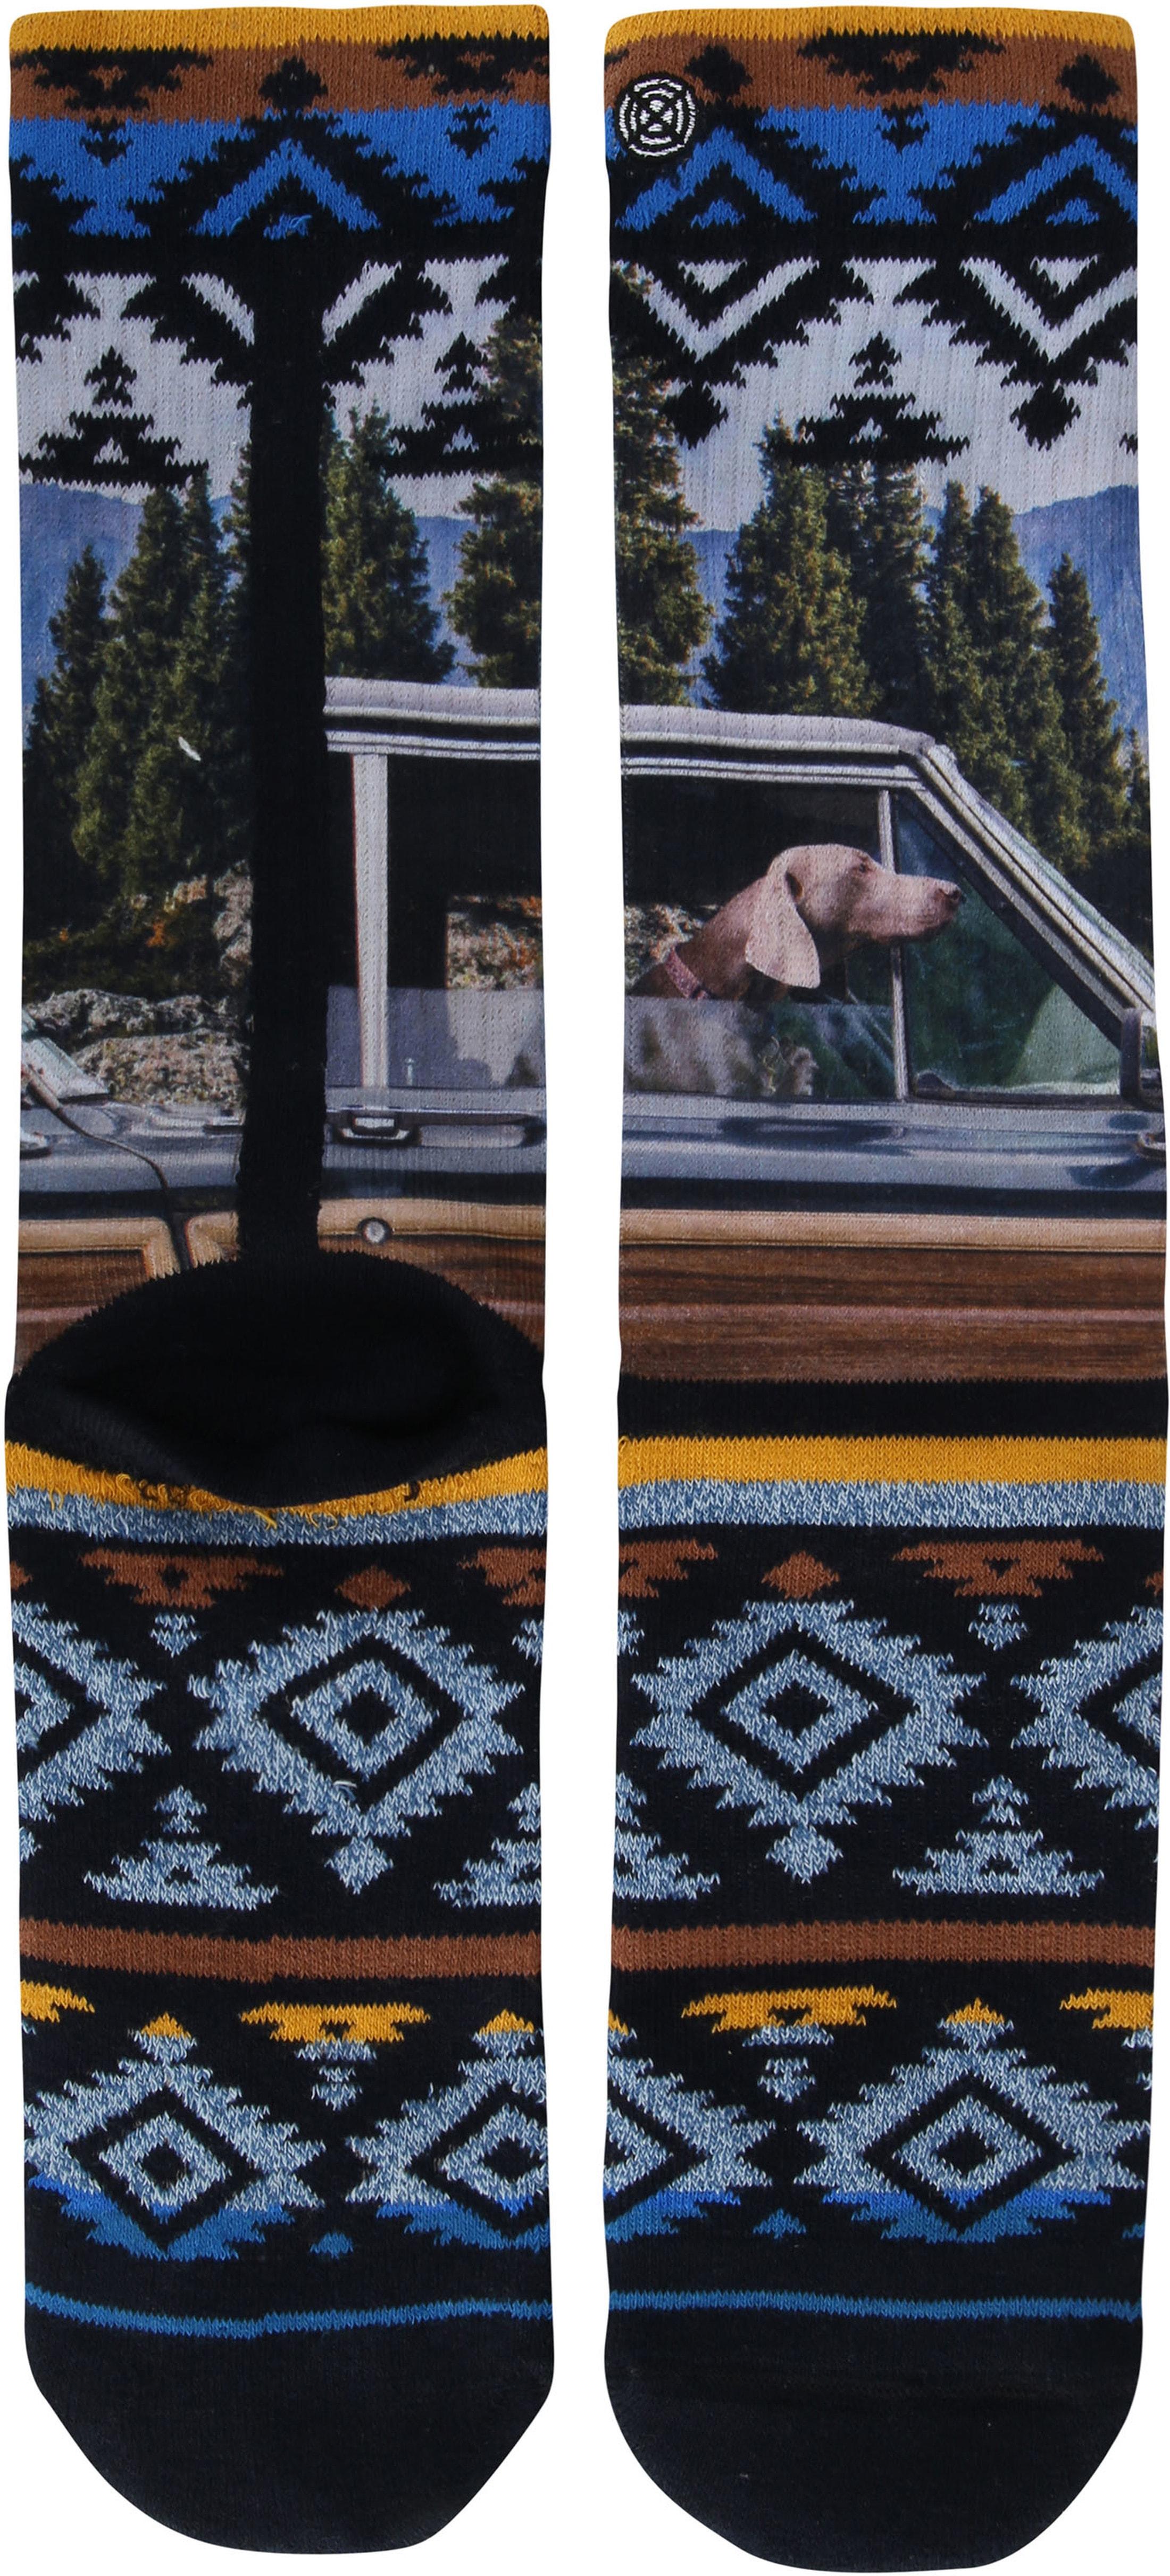 Xpooos Sokken Dog In Car